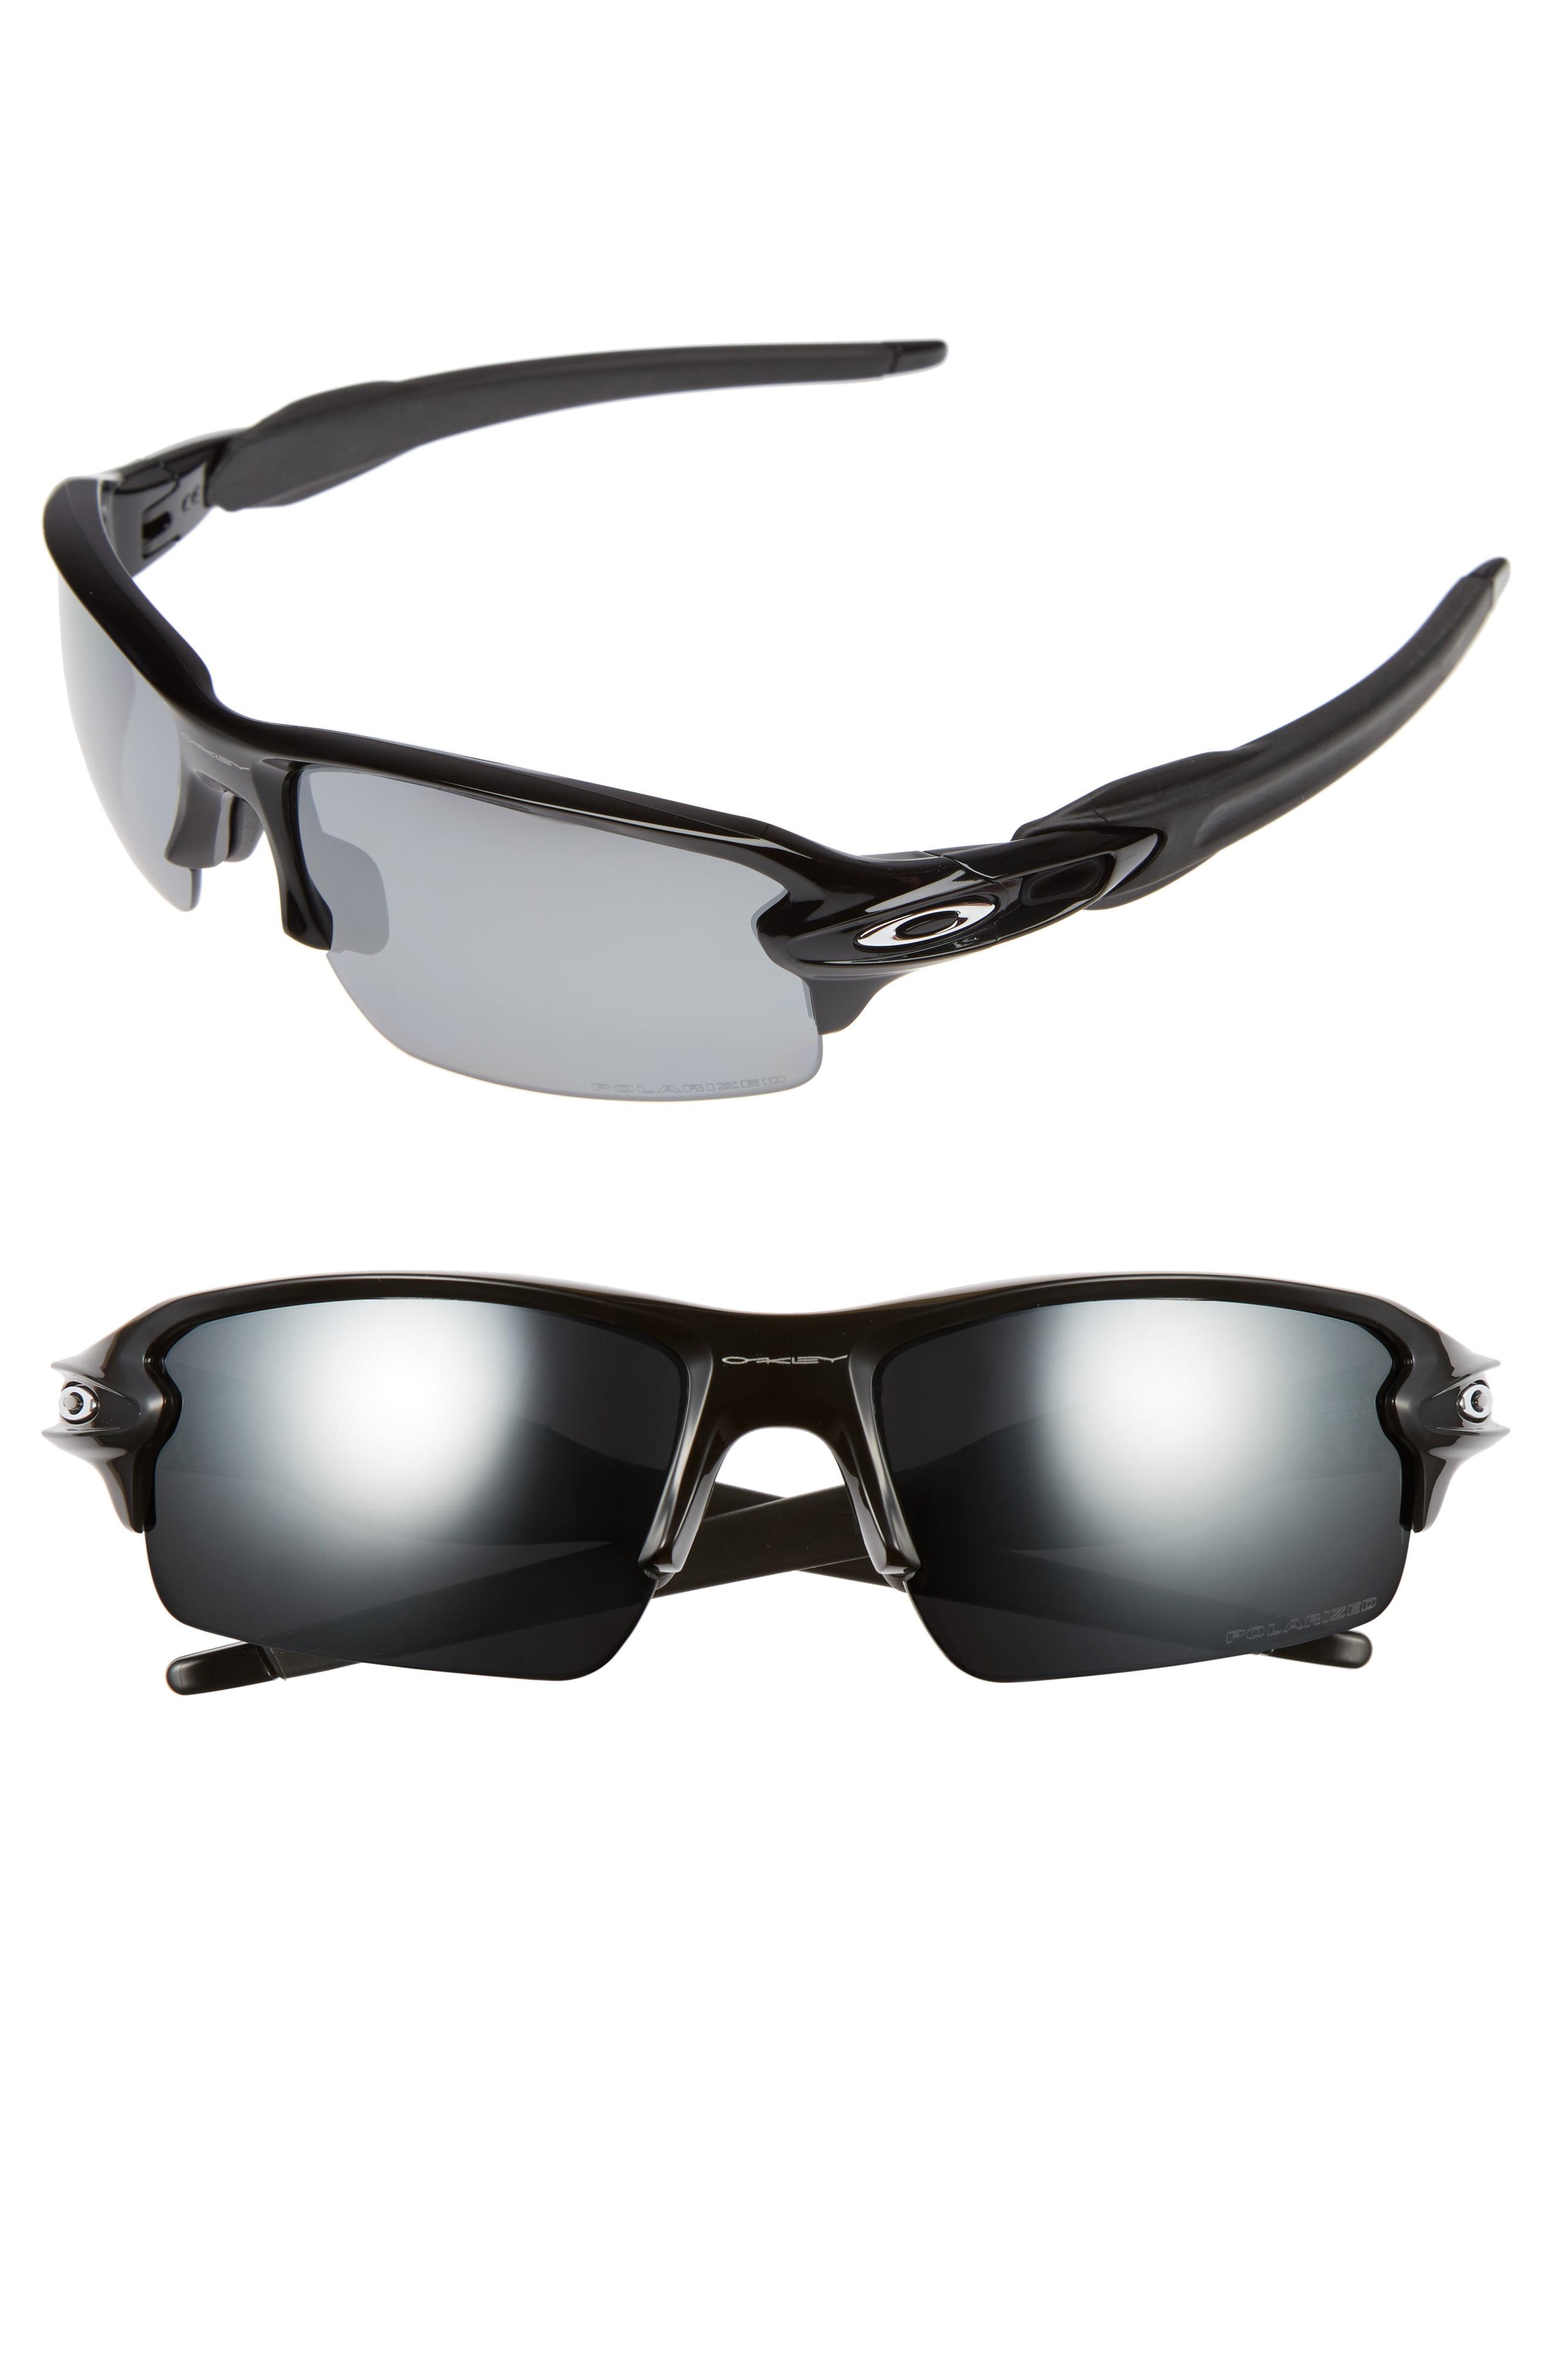 Oakley Flak 2.0 59mm Polarized Sunglasses 96.49 at Nordstrom $96.49